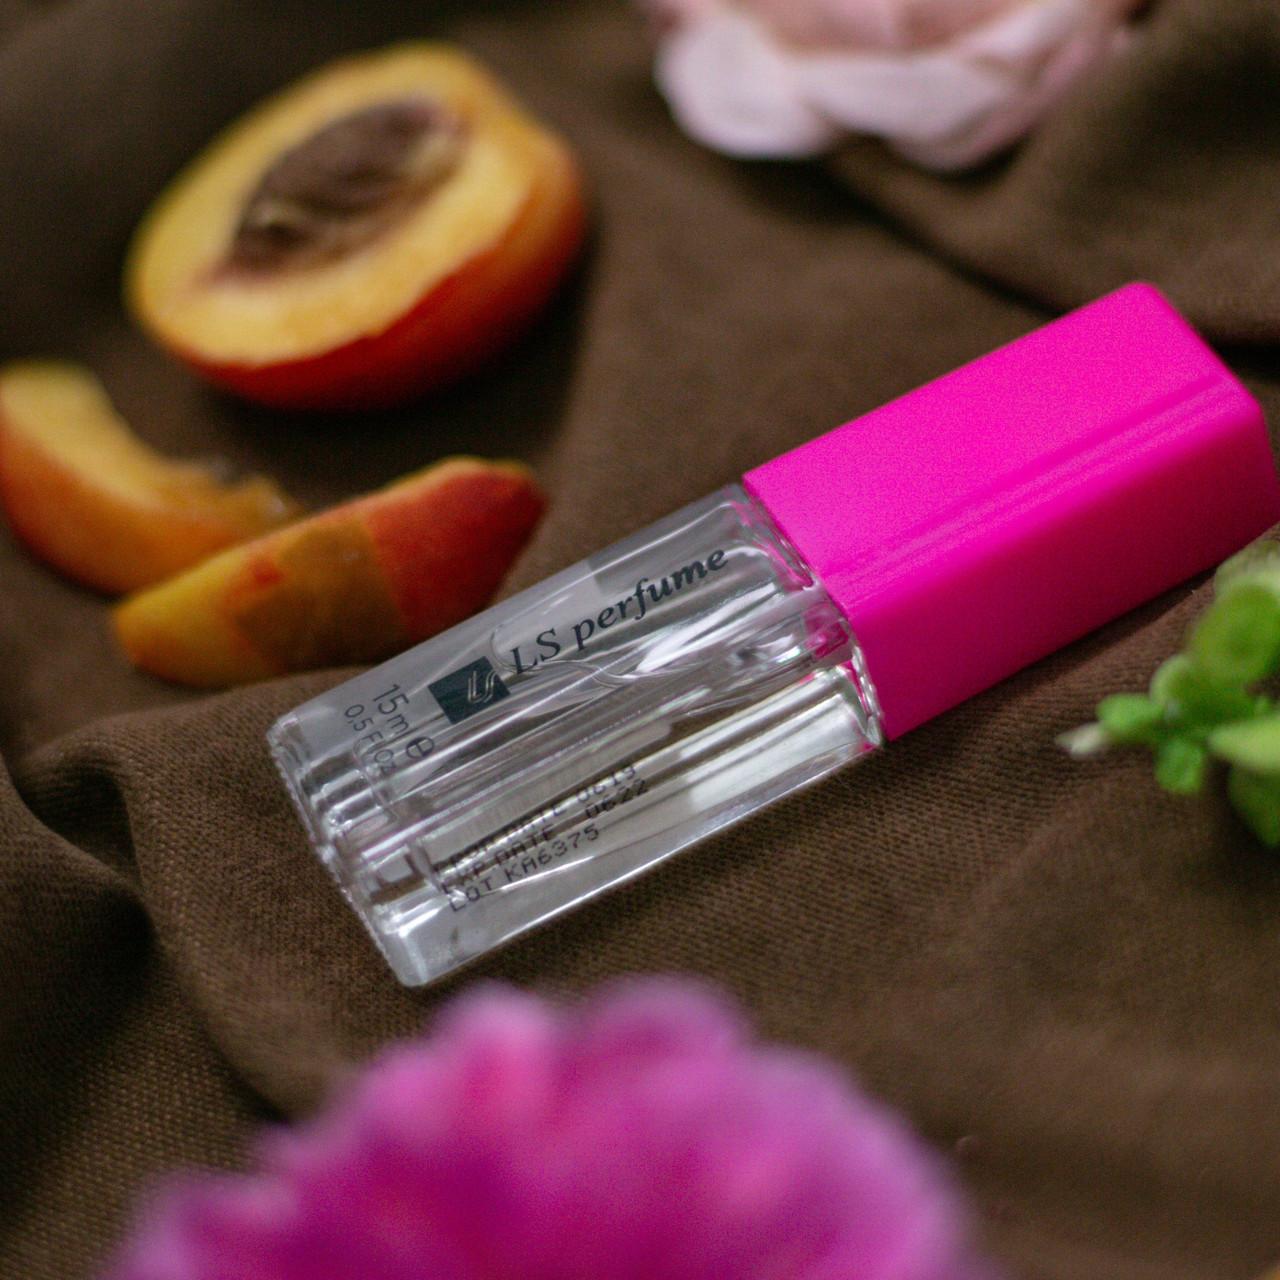 K310, Miss Dior Cherie Blooming Bouquet 2007, Dior 15ml